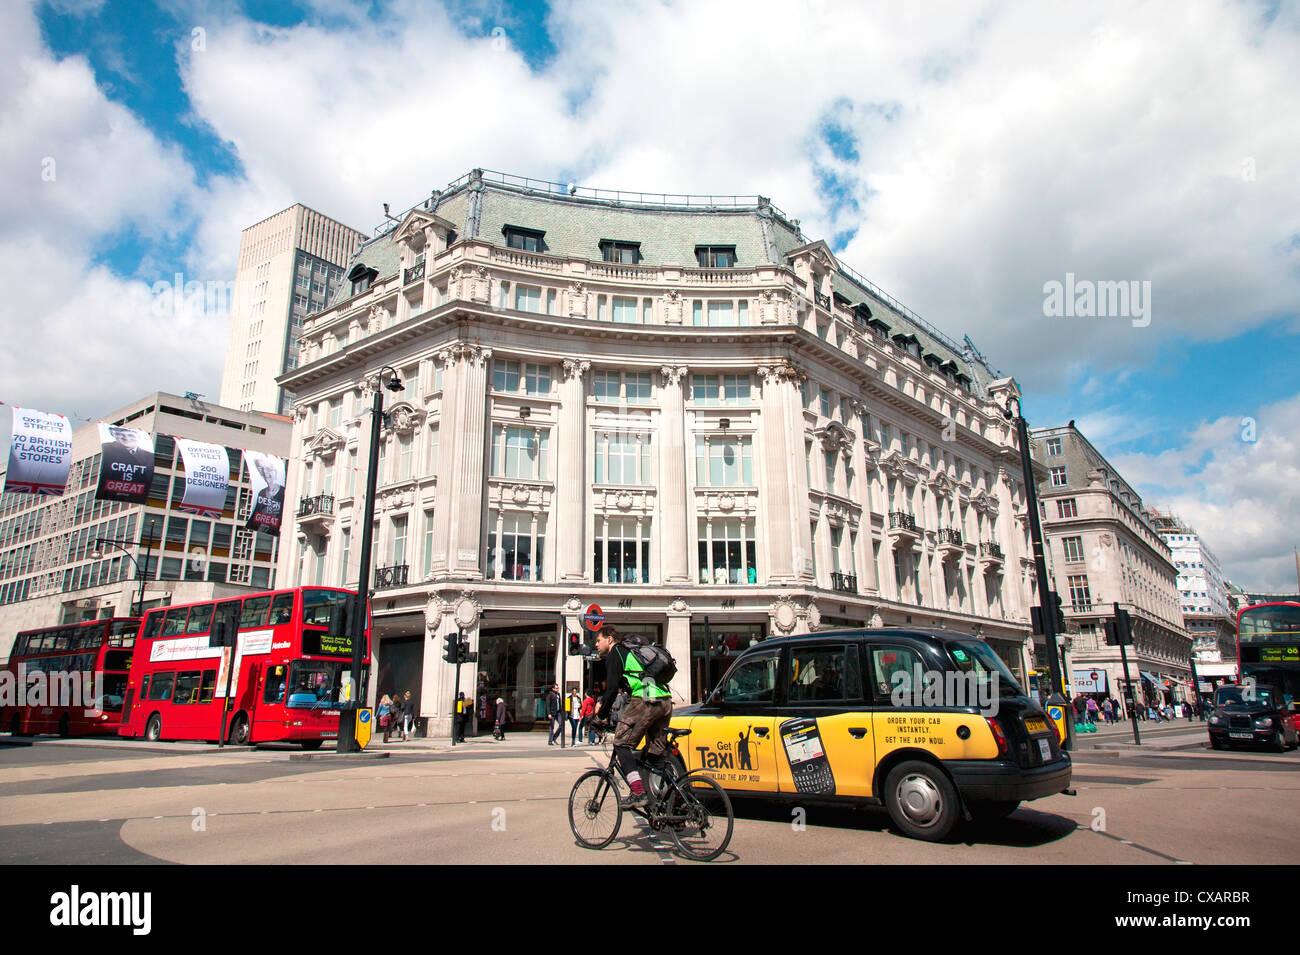 Diagonal pedestrian crossing at Oxford Circus, London, England, United Kingdom, Europe - Stock Image